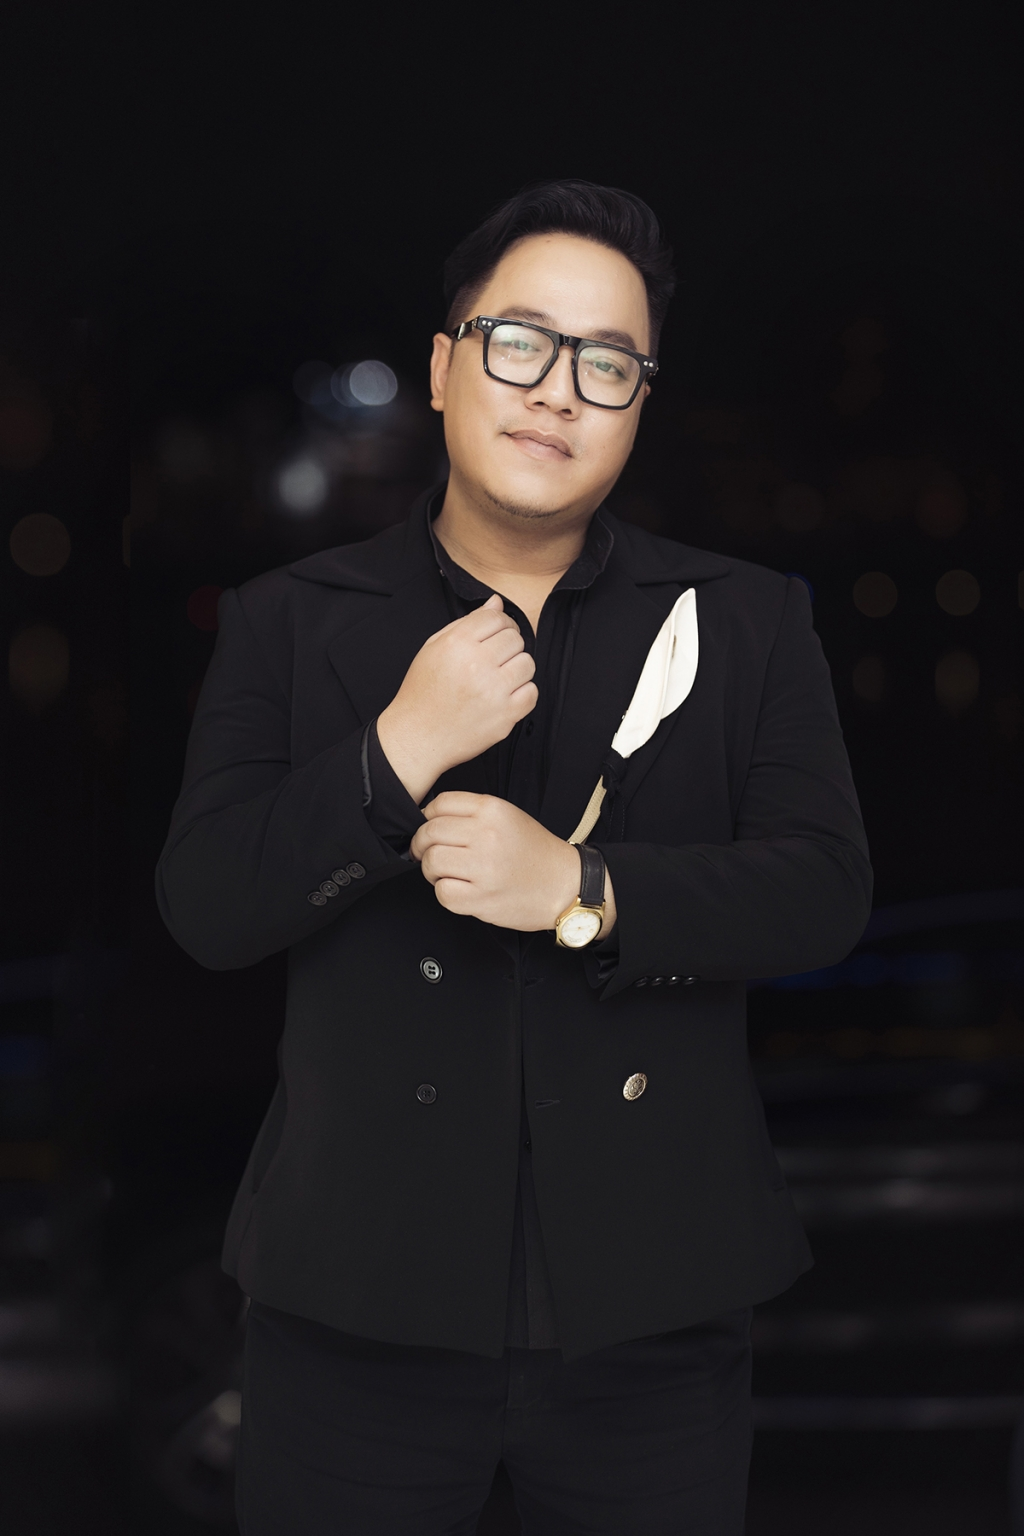 huong giang cung do my linh luong thuy linh chat chem nhau trong talkshow hoa hau viet nam 2020